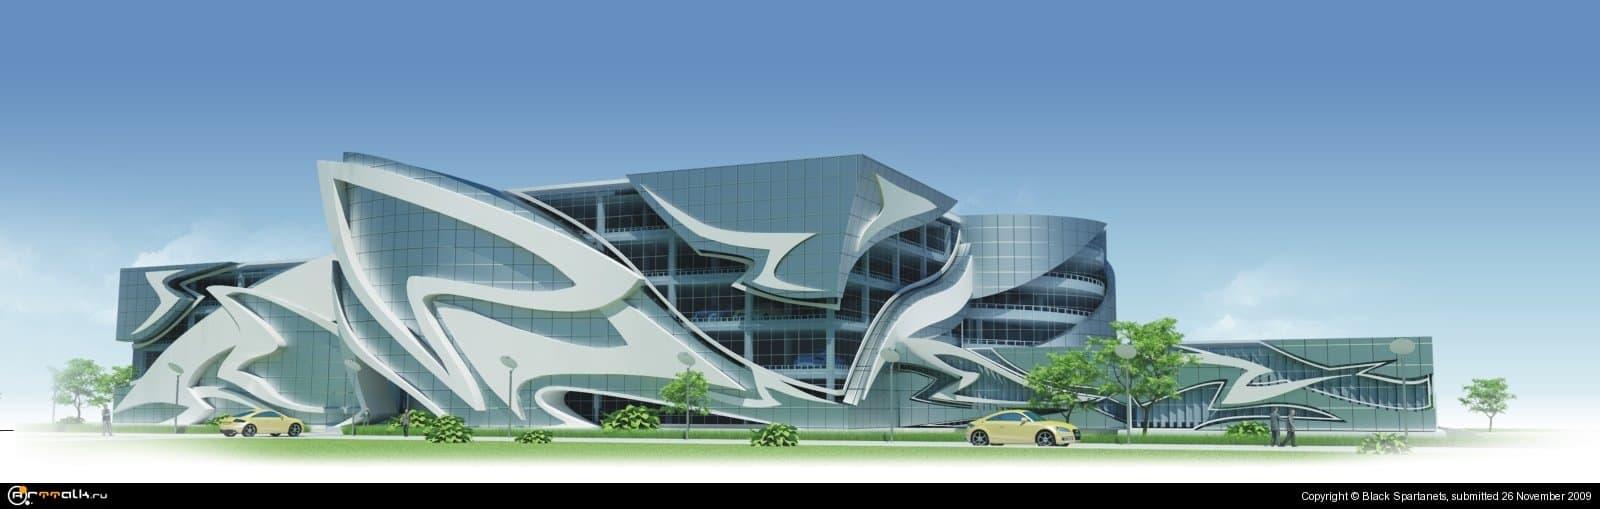 Проект гаража на 222 автомобиля.